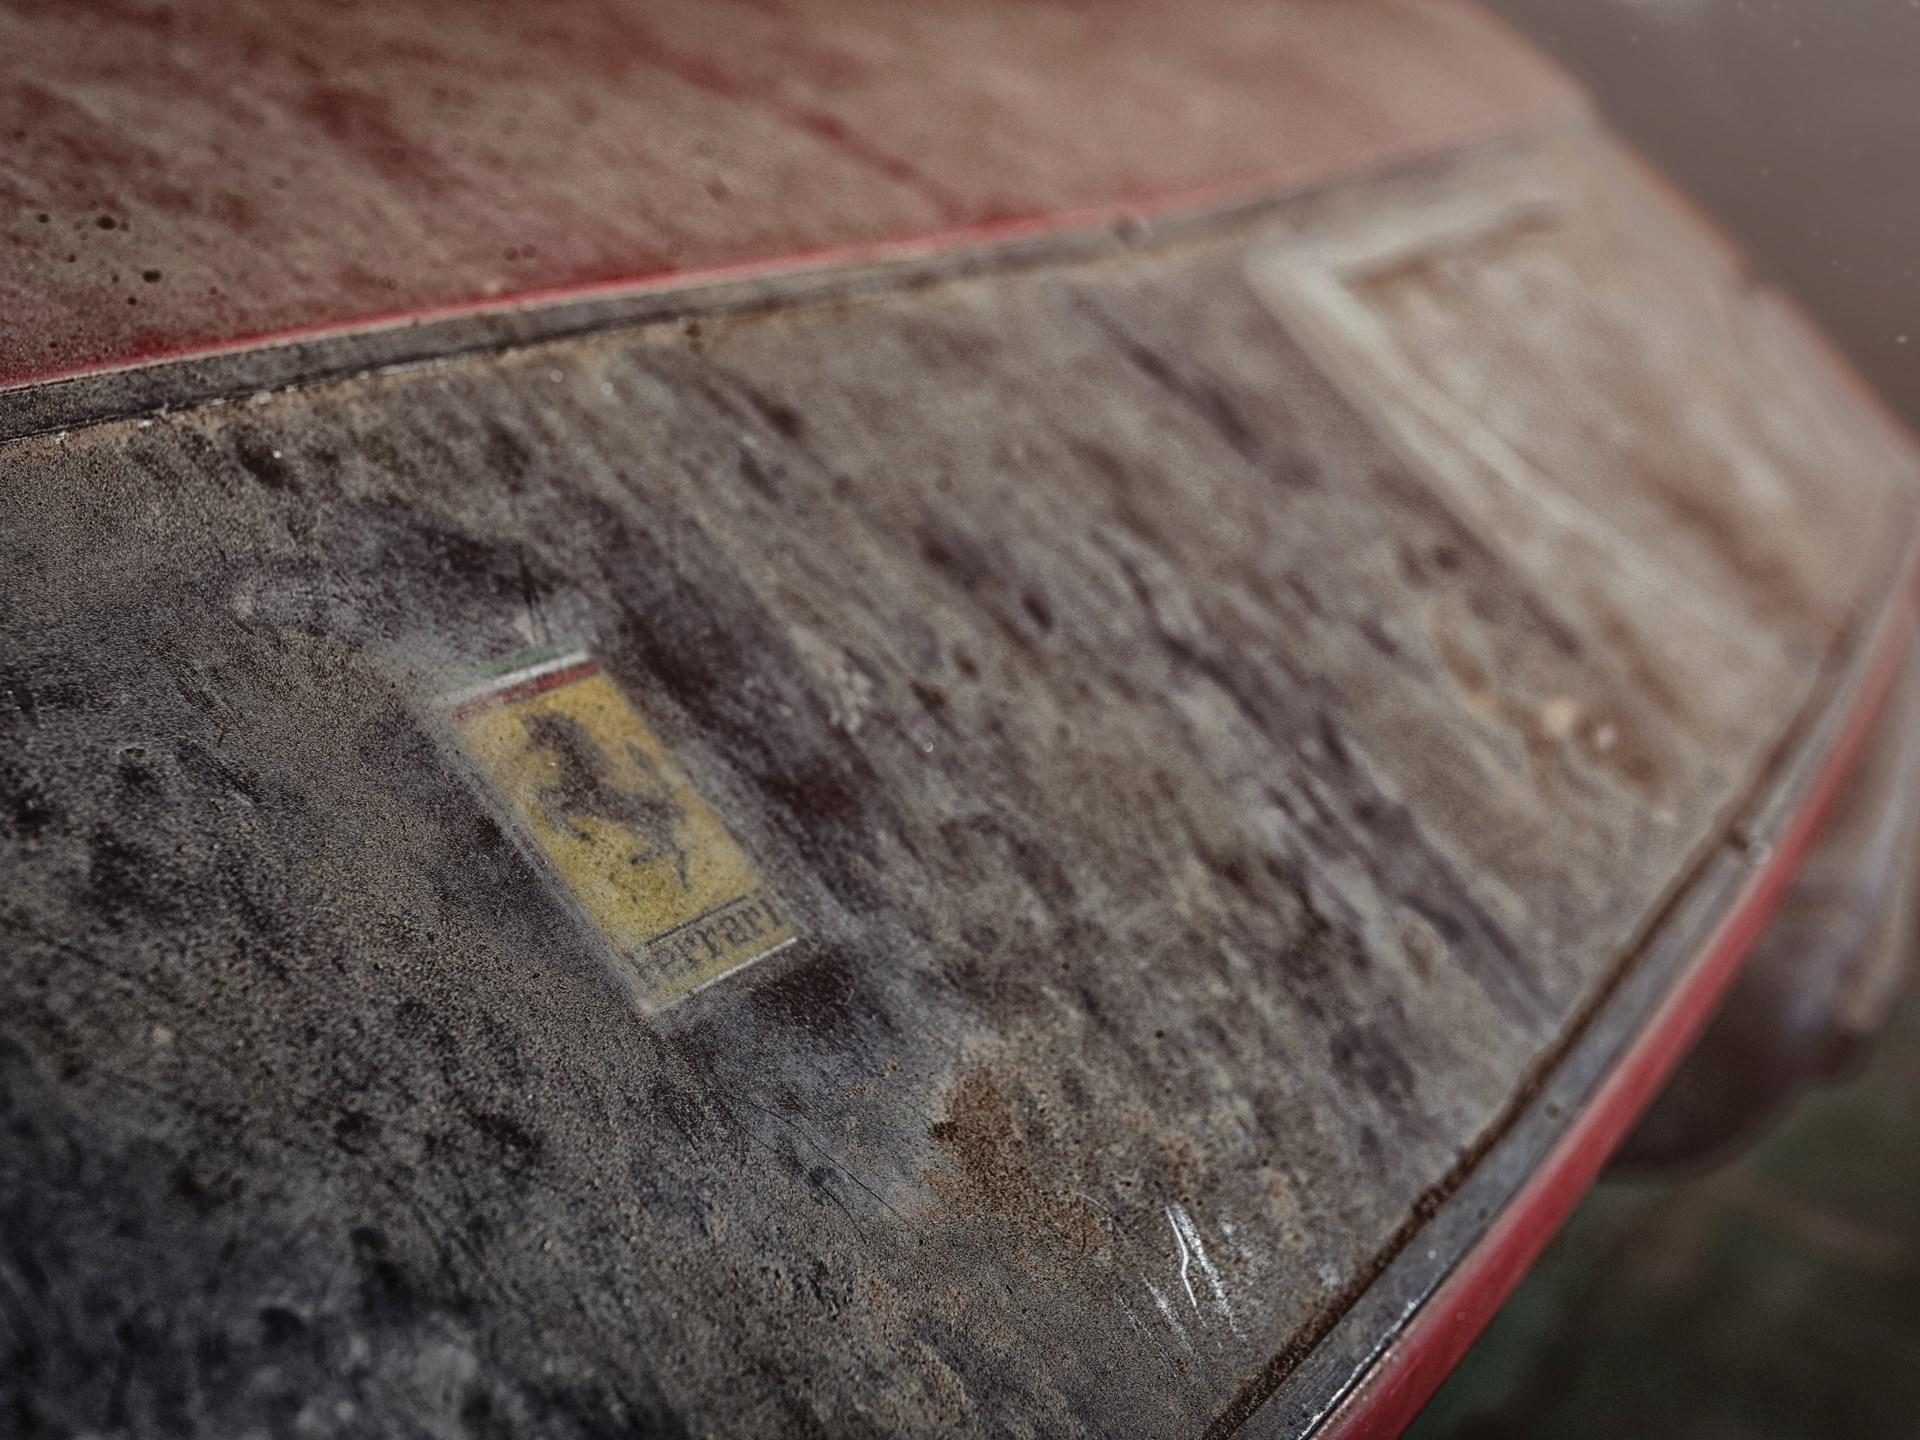 1969 Ferrari 365 GTB/4 Daytona Berlinetta Alloy by Scaglietti